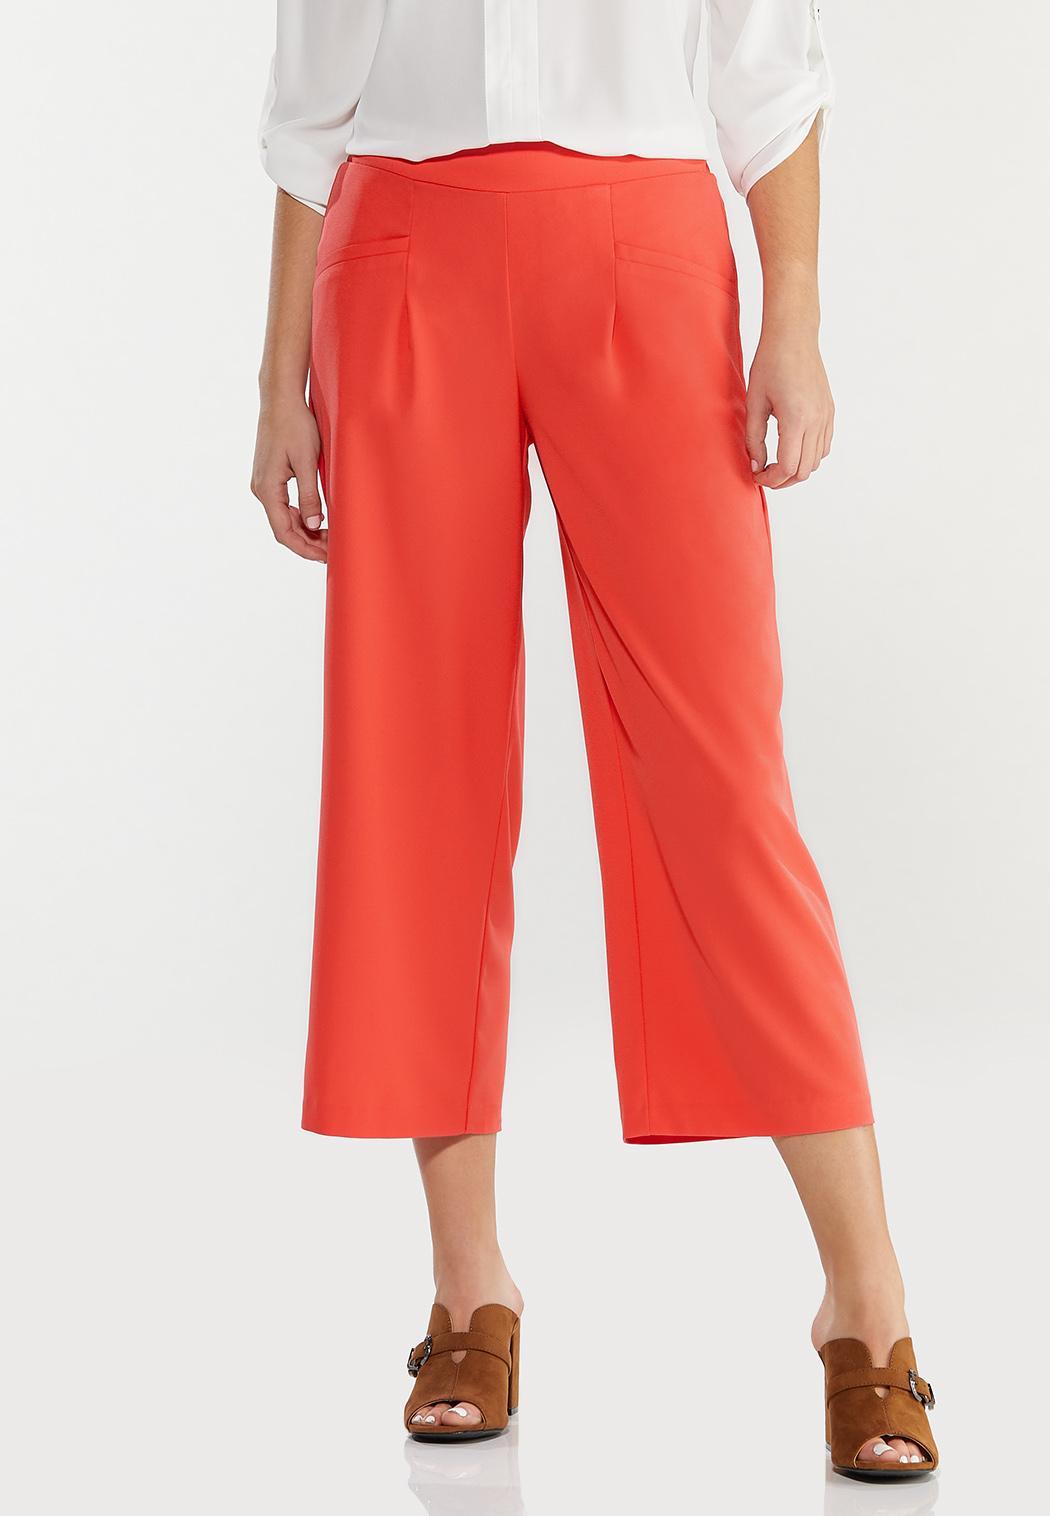 Cropped Spice Wide Leg Pants